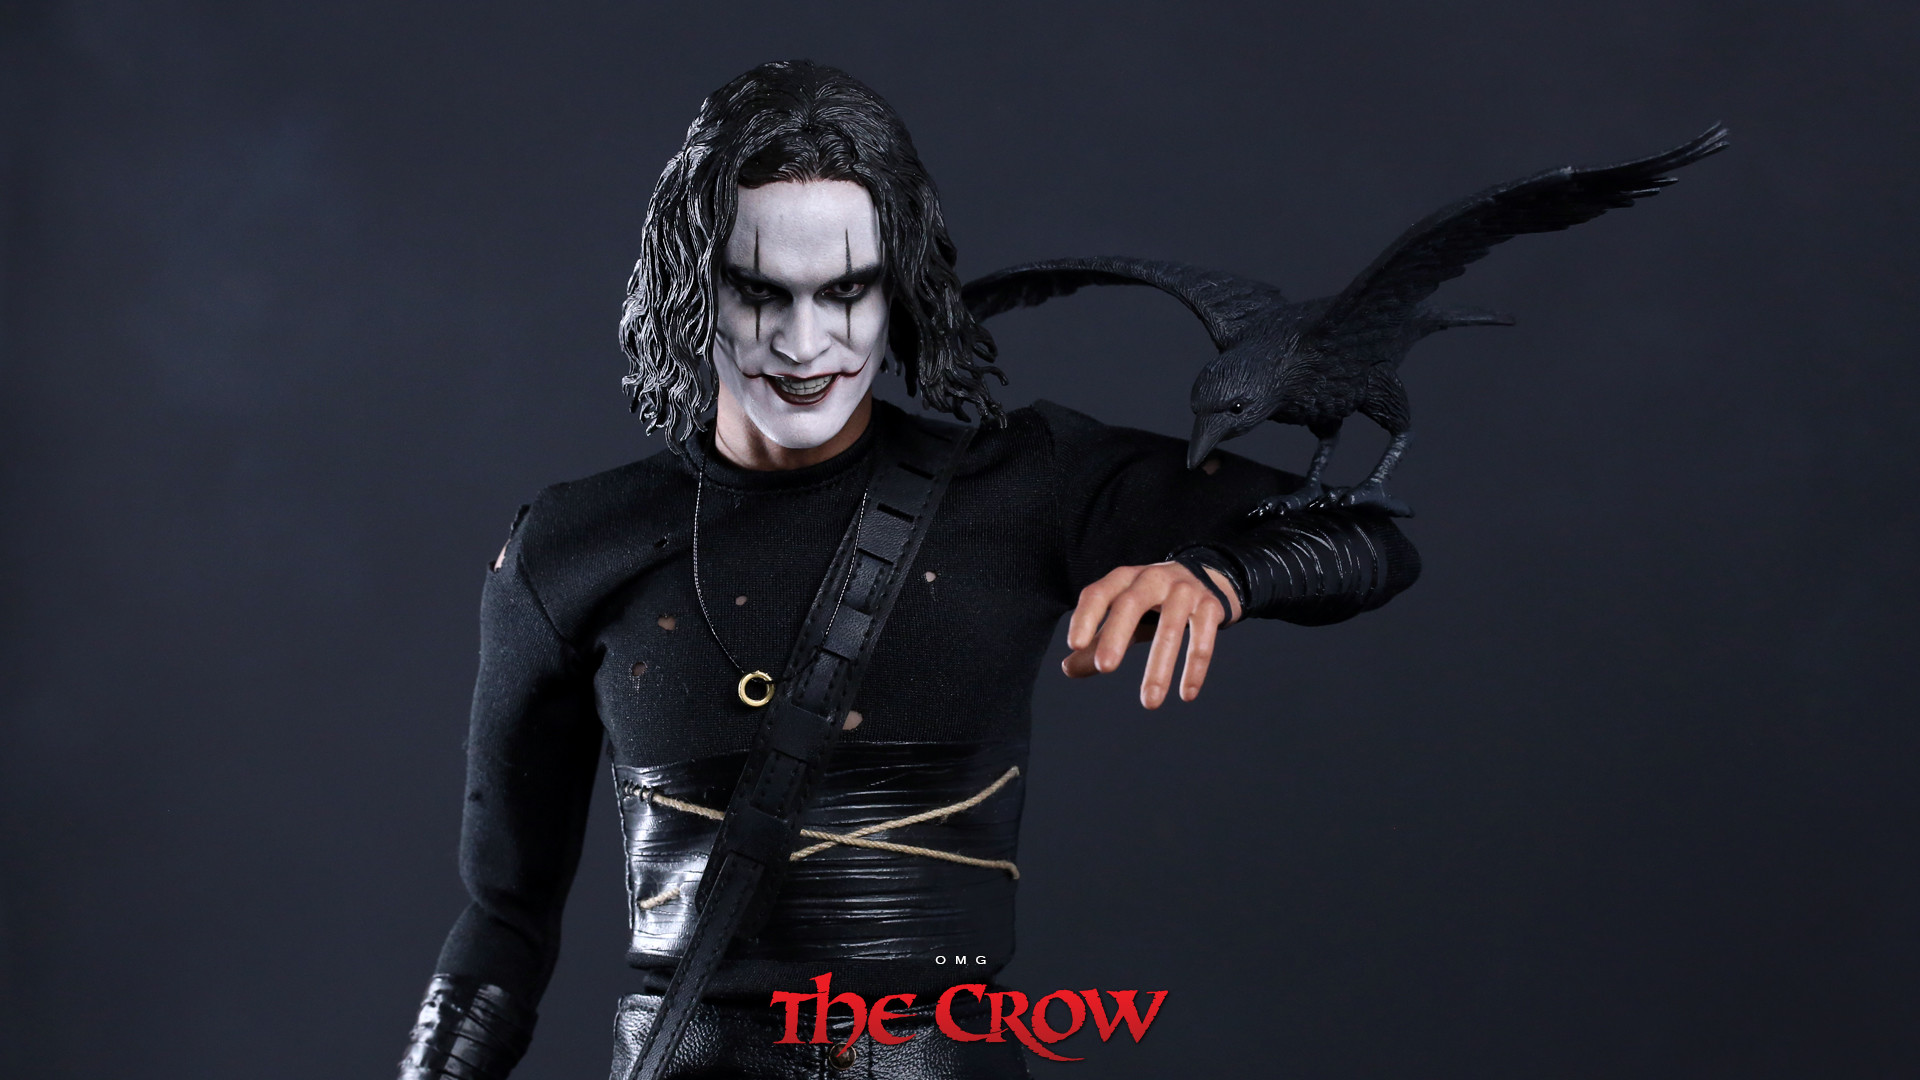 Brandon lee the crow